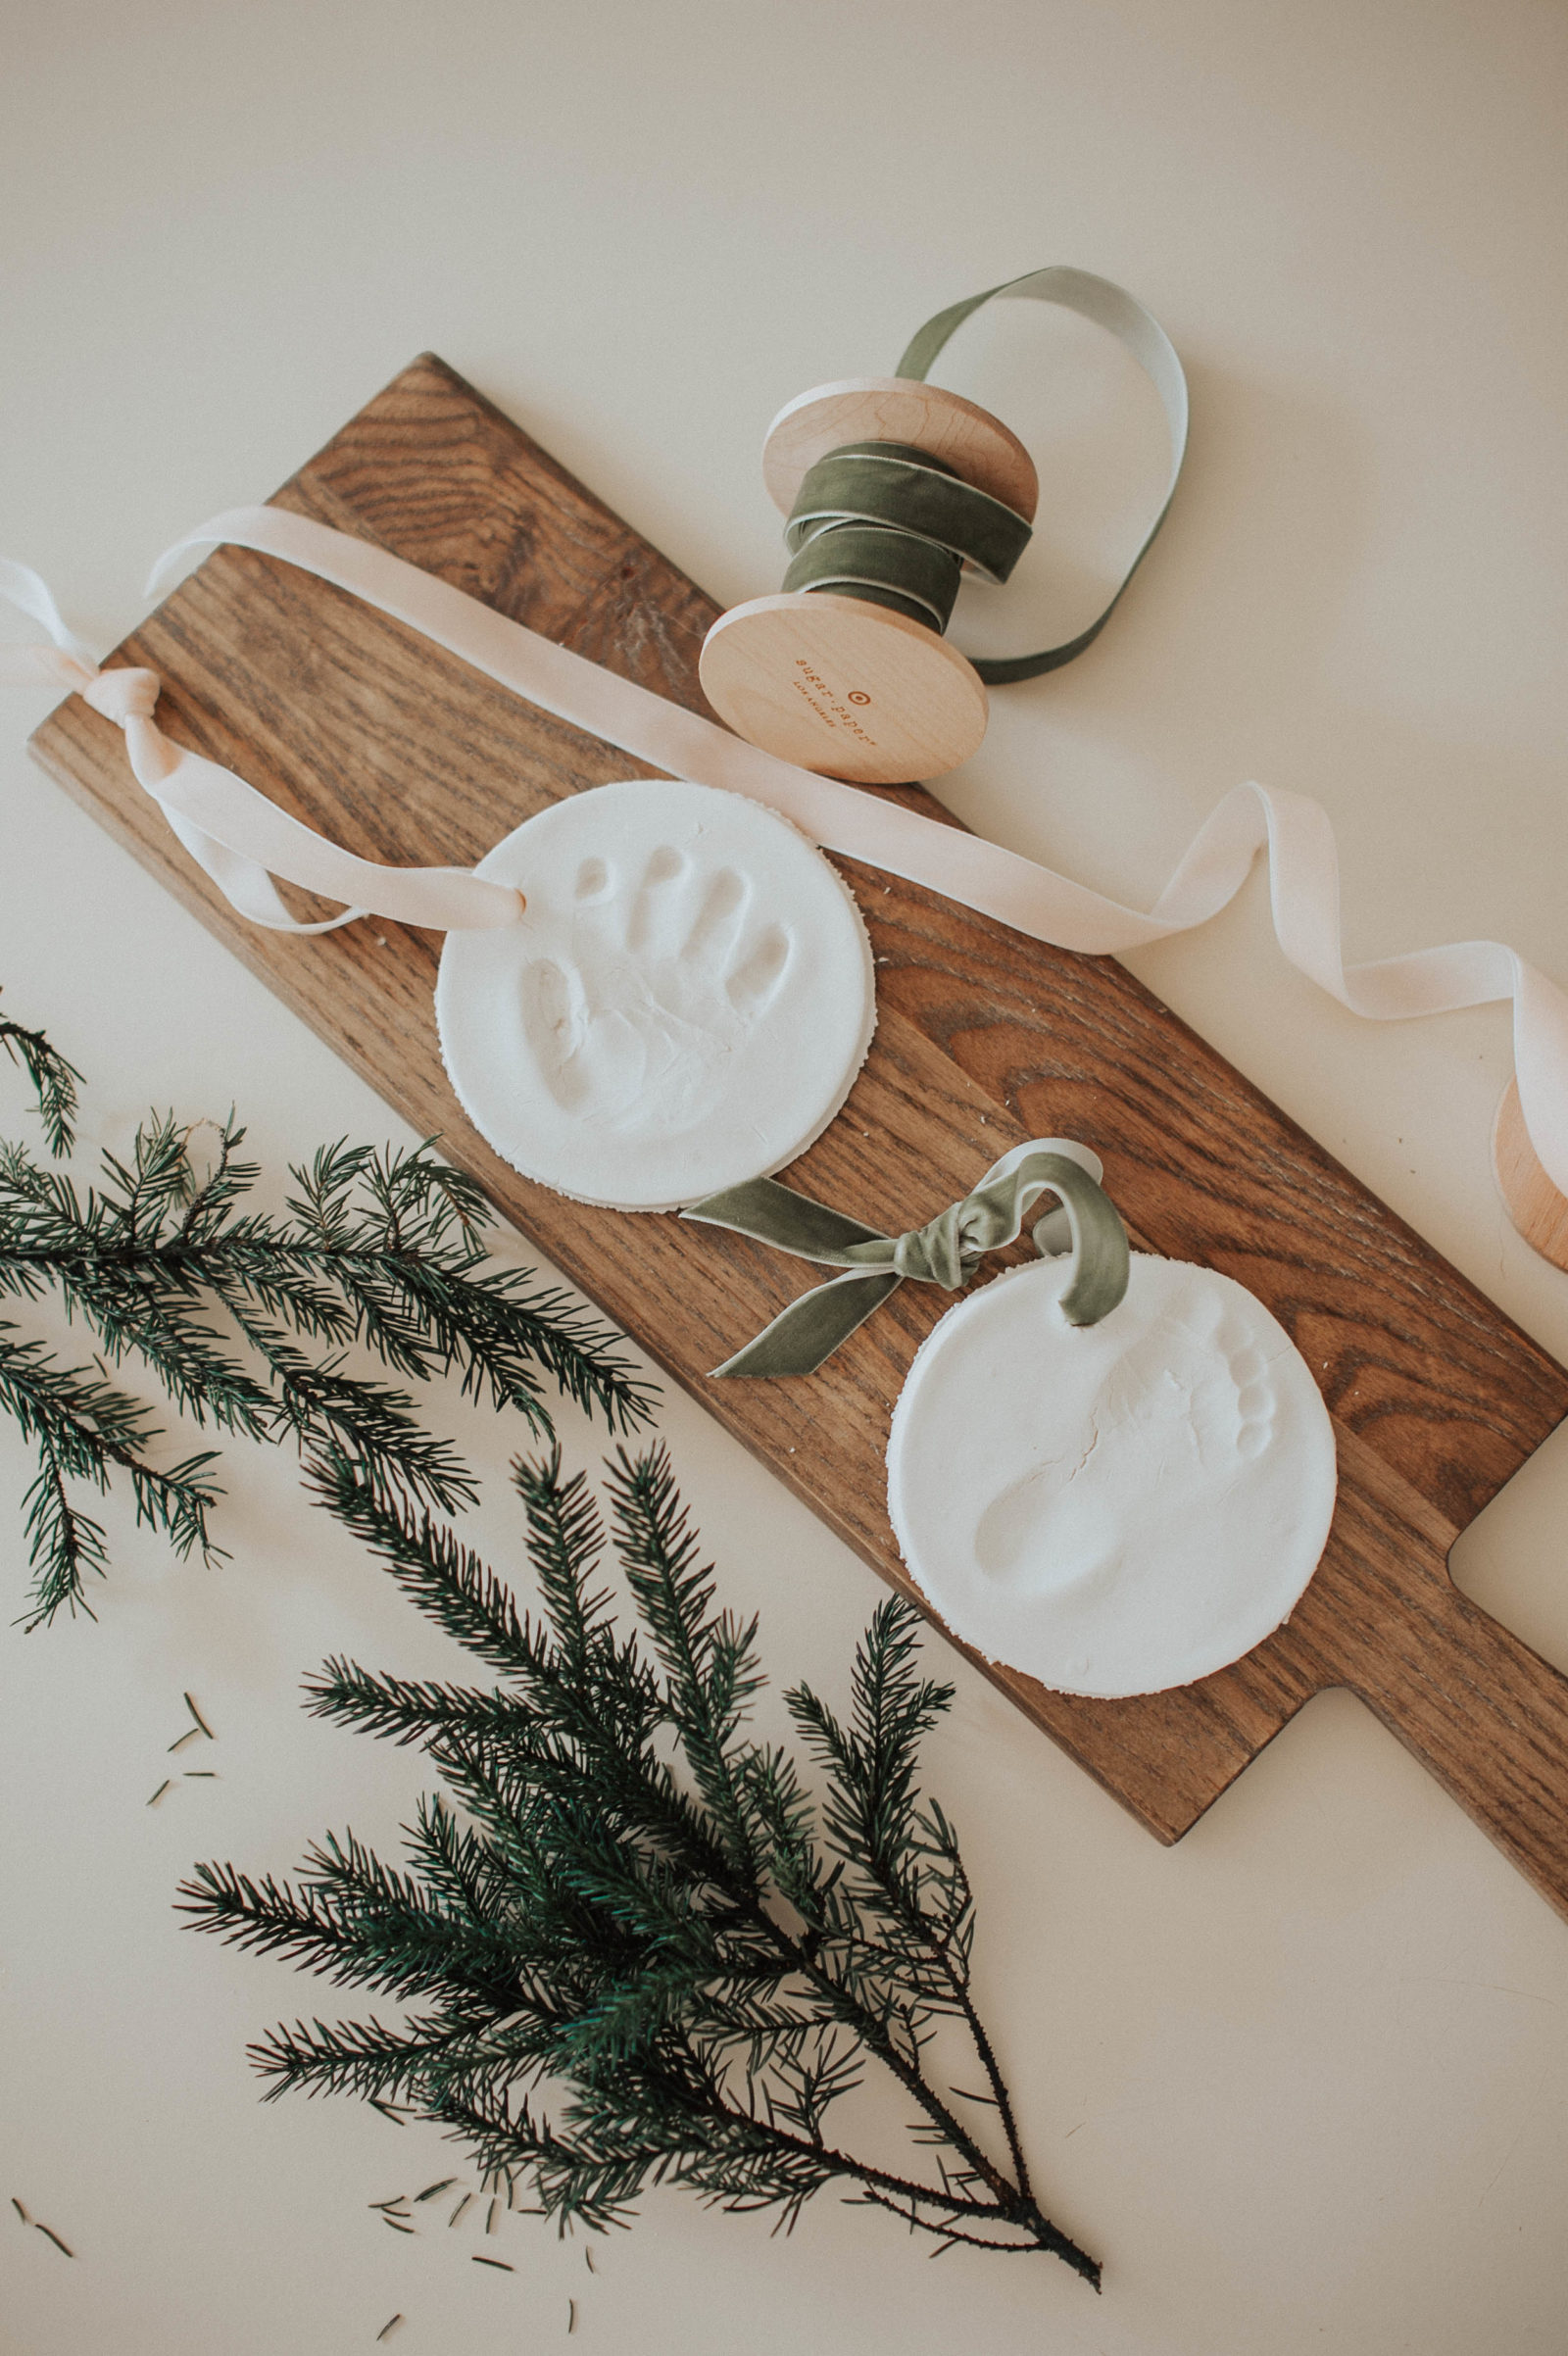 Homemade Clay Ornaments - Oak + Oats